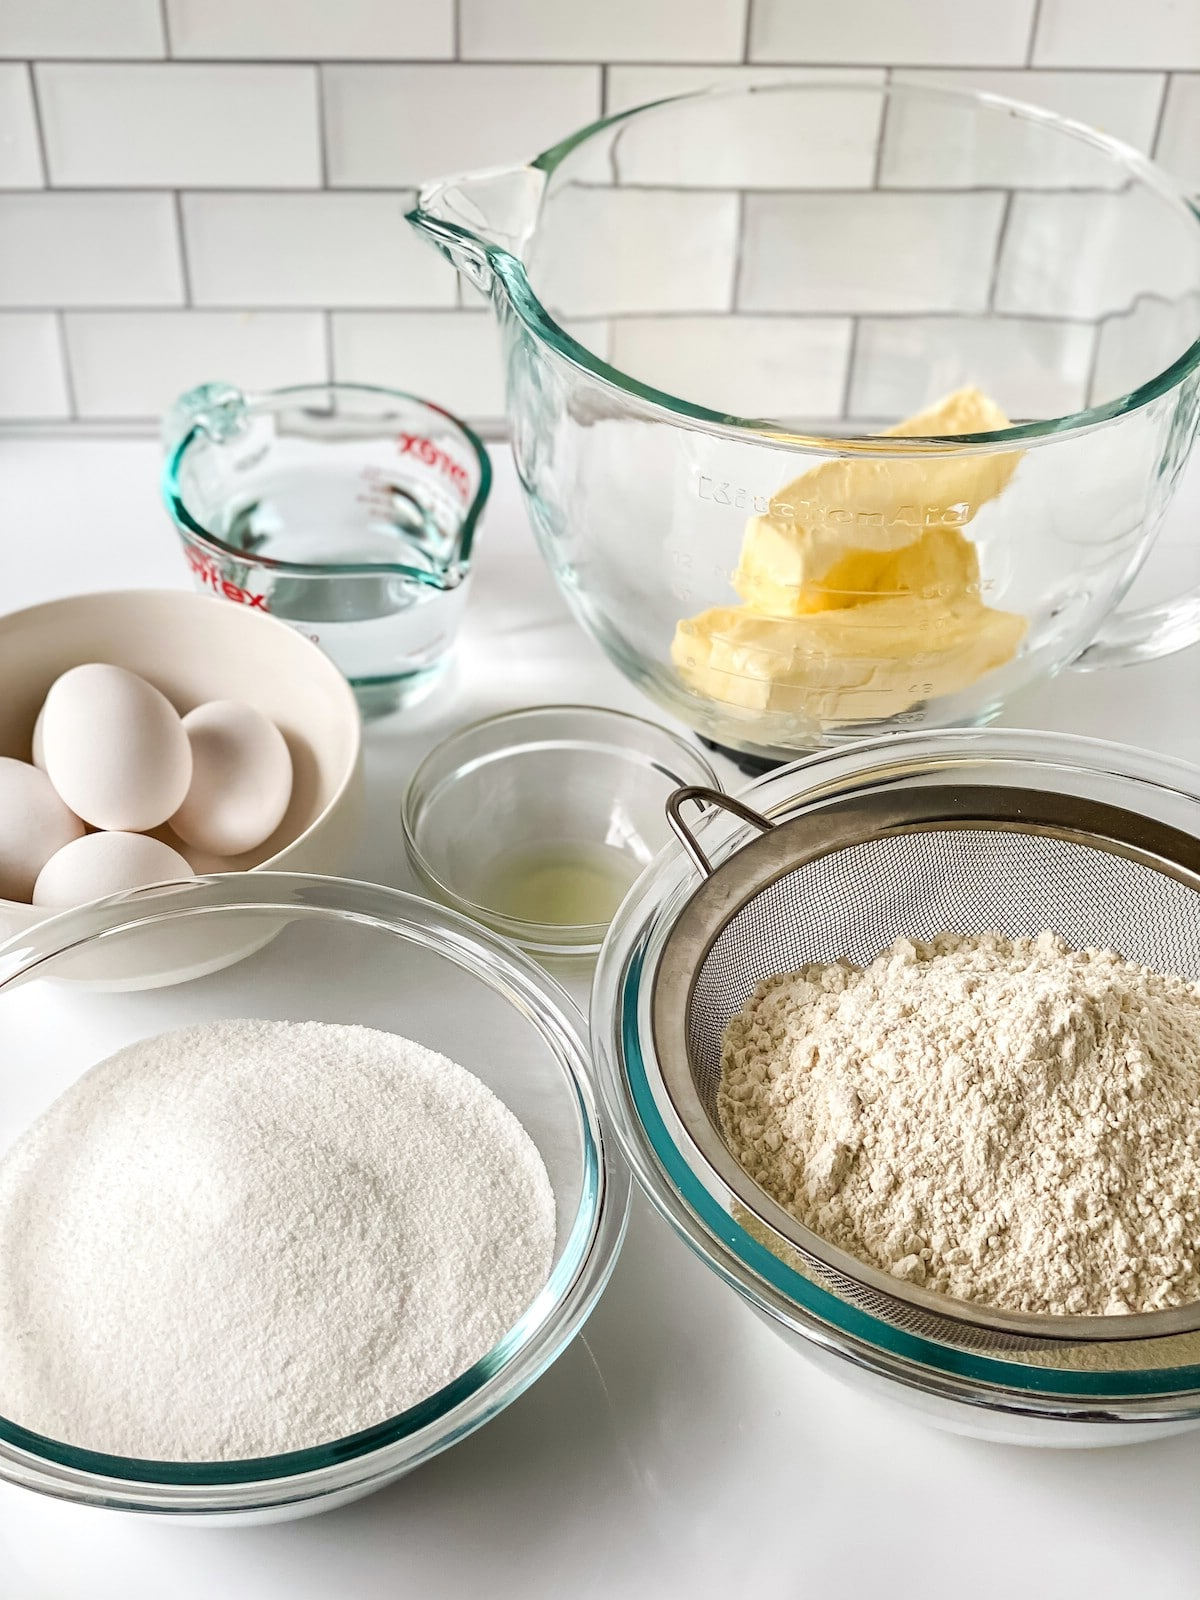 Ingredients for 7 up cake recipe